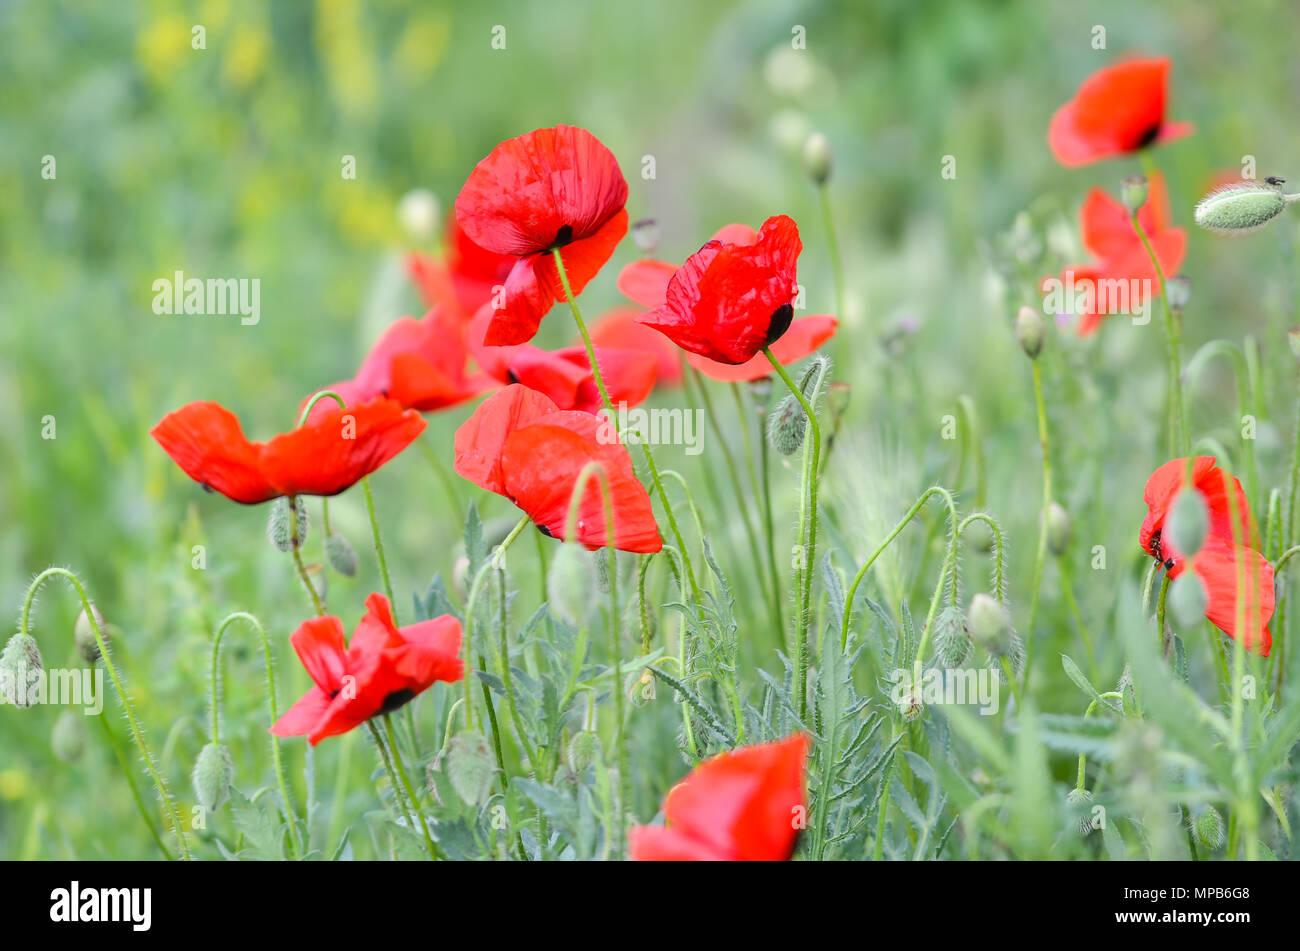 Field Of Poppy Flowers On A Windy Day Stock Photo 185872744 Alamy